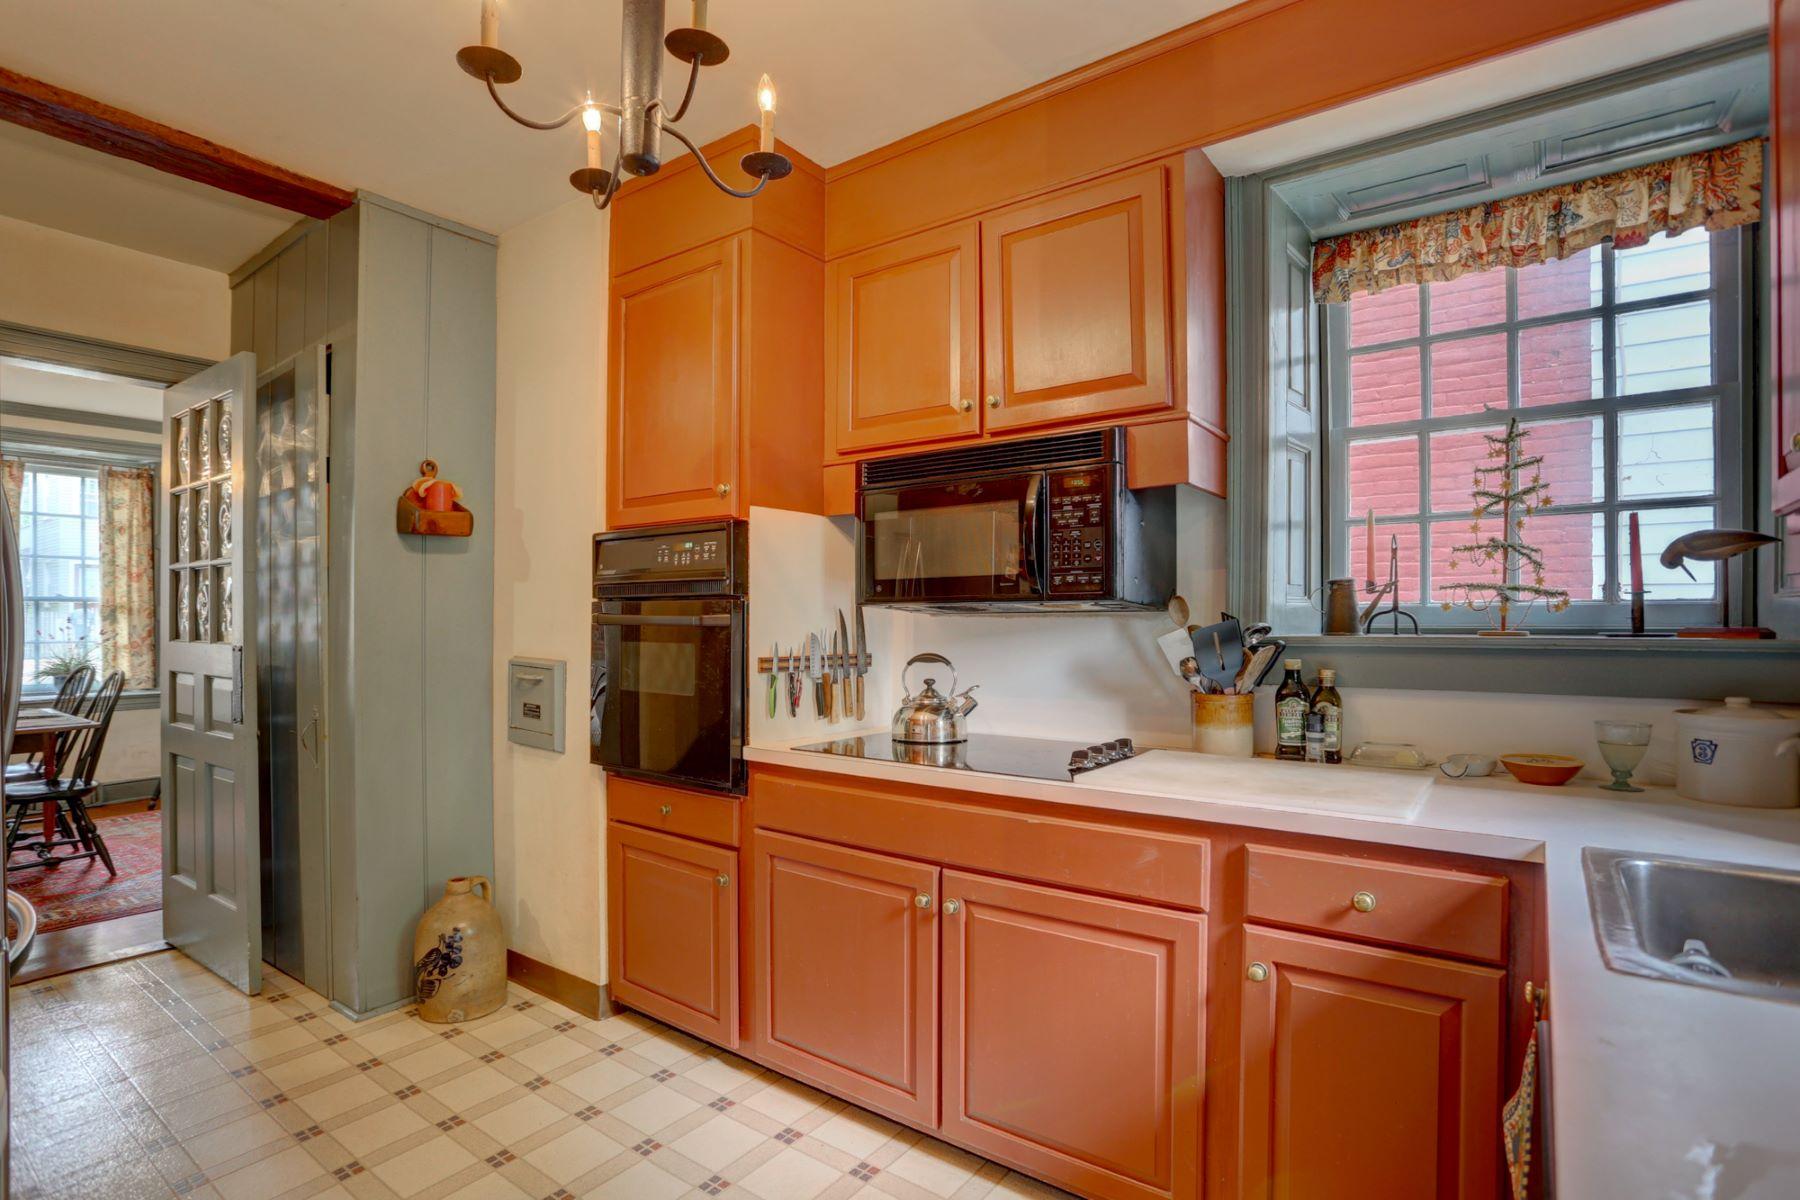 Additional photo for property listing at 121 E Main Street 121 E Main Street 立提兹市, 宾夕法尼亚州 17543 美国